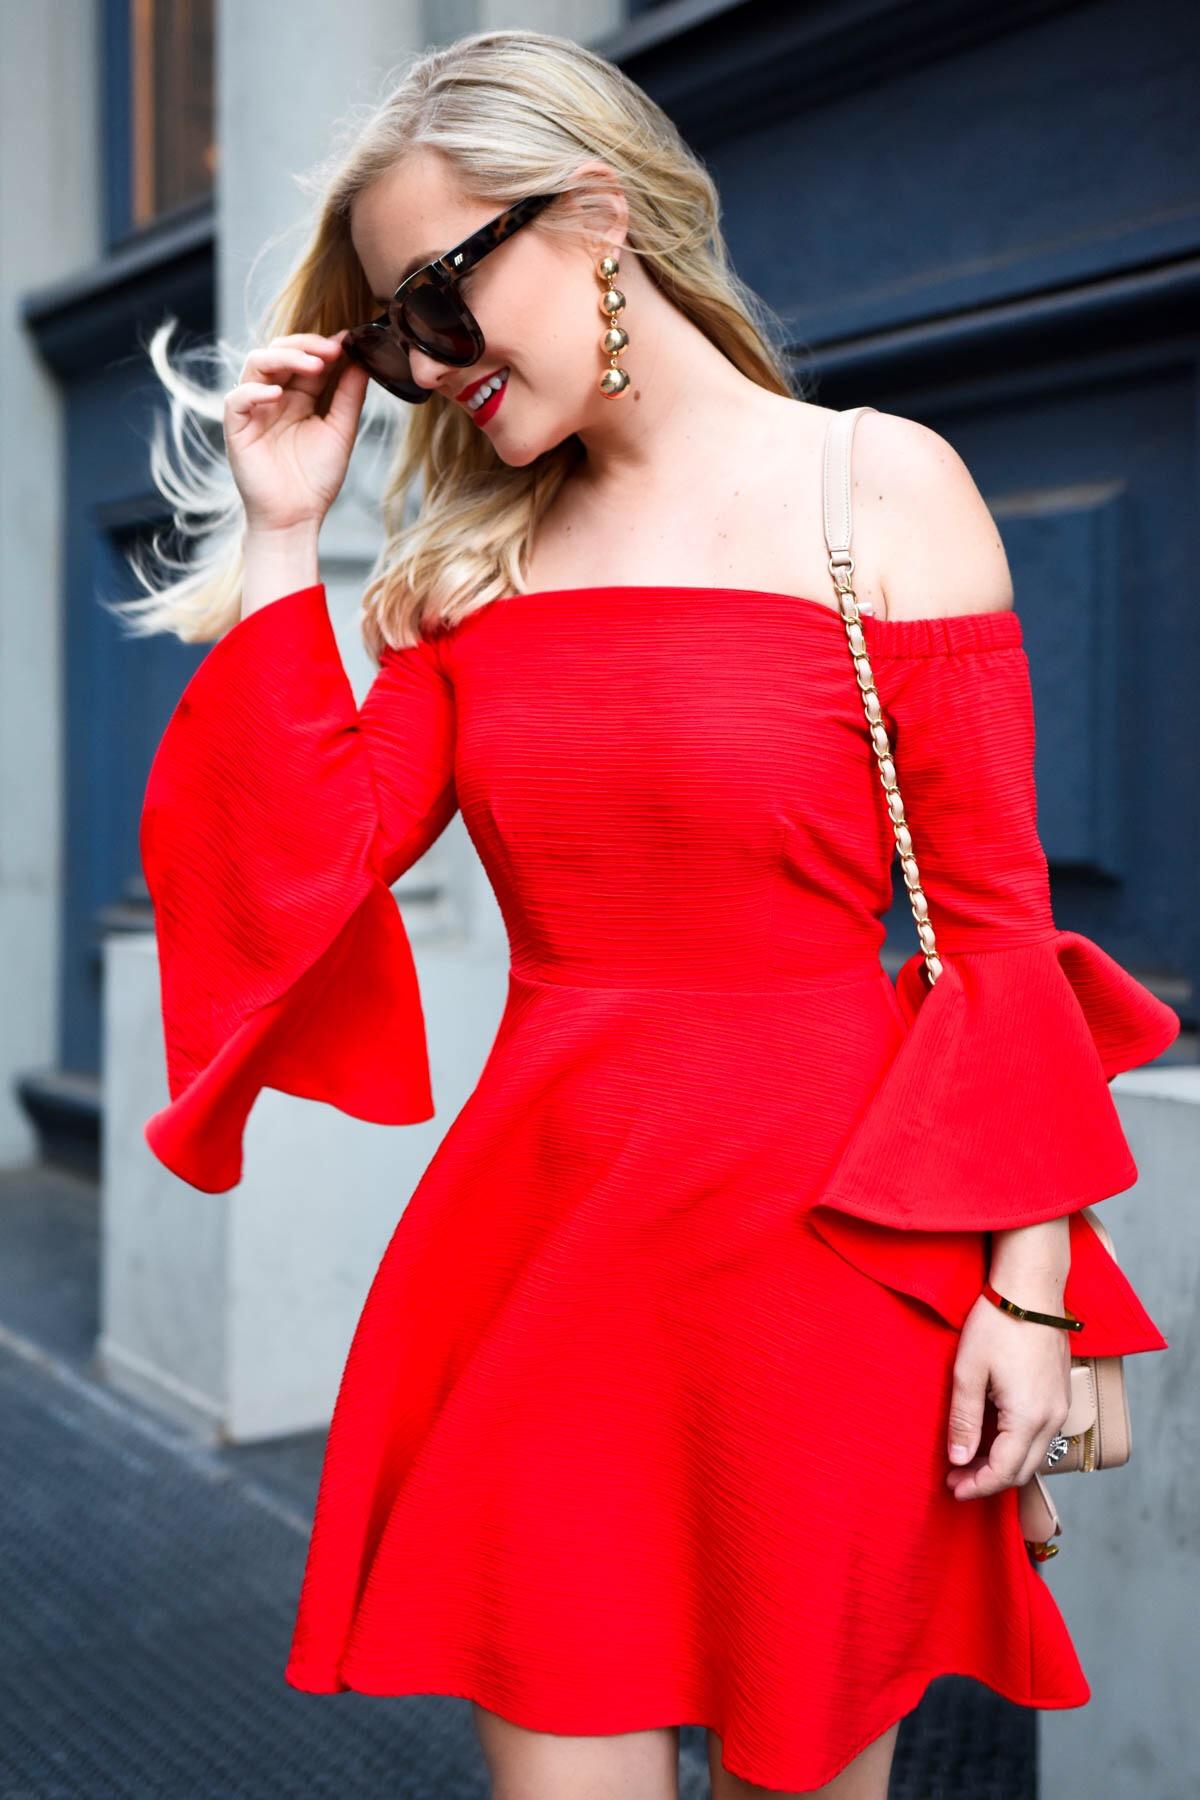 Red off the shoulder dress, red ruffle dress, red dress under $100, chanel handbag, alexandre birman shoes, lomurphy, dallas blogger, travel blogger, street style, date night dress